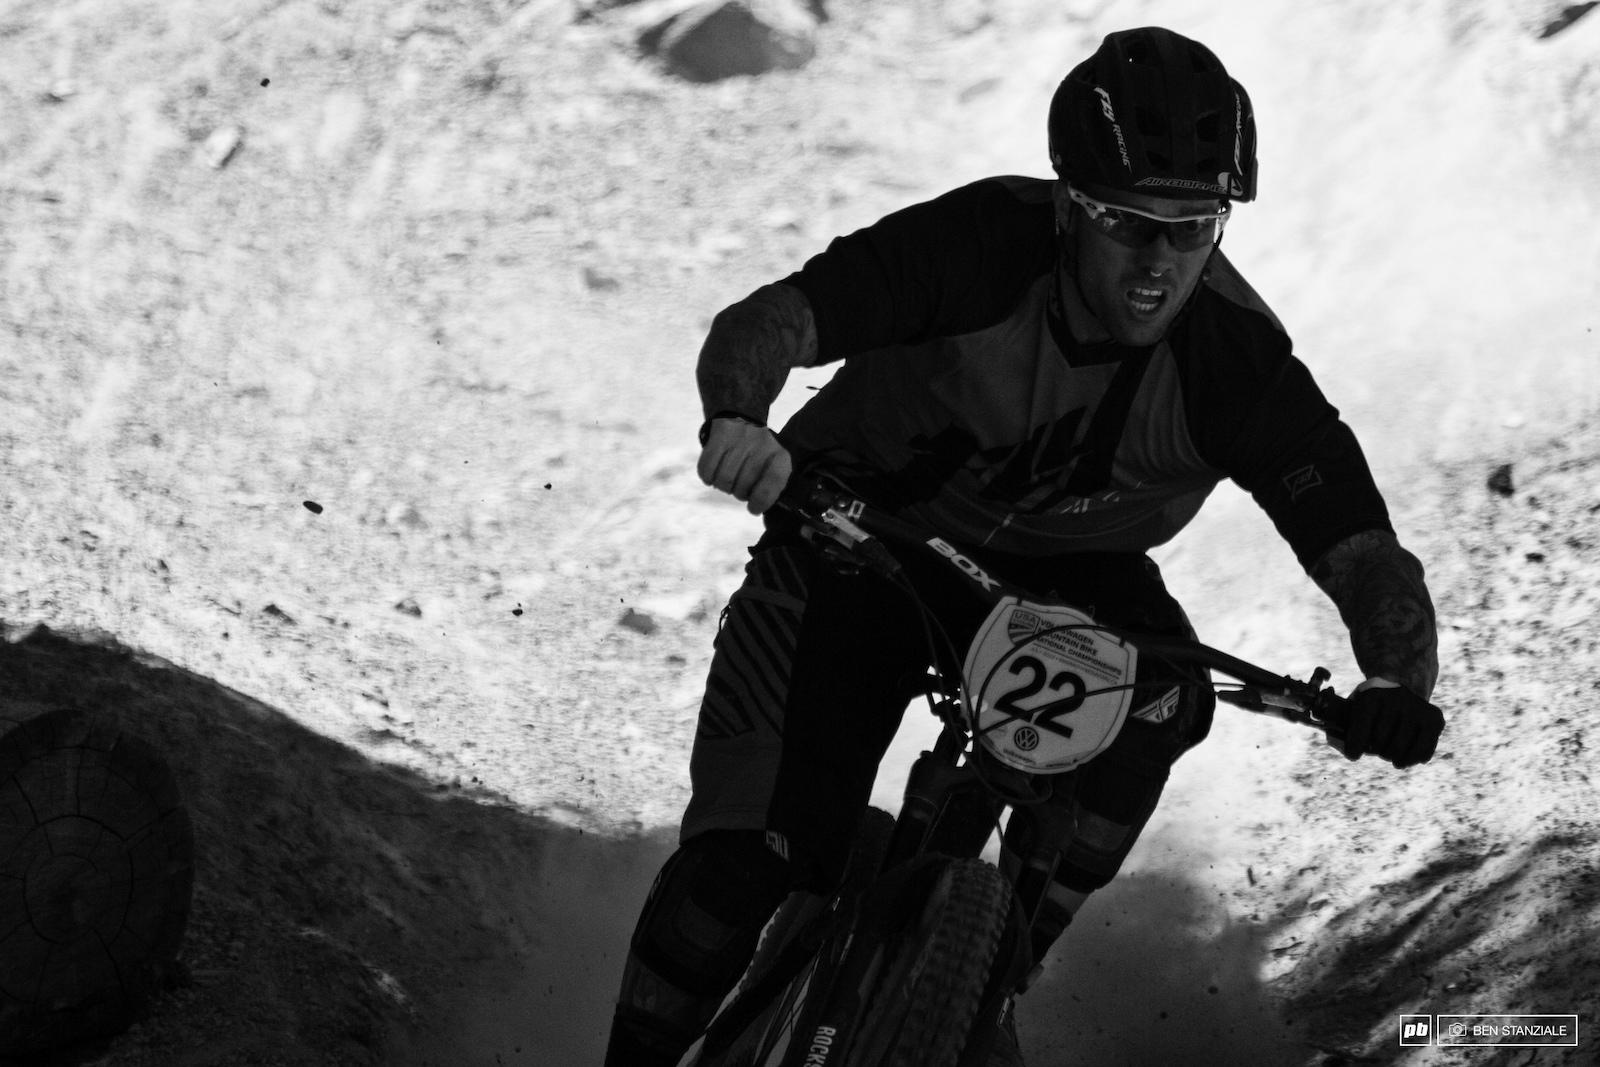 BMX racer Barry Nobles on track for Sunday s Enduro.